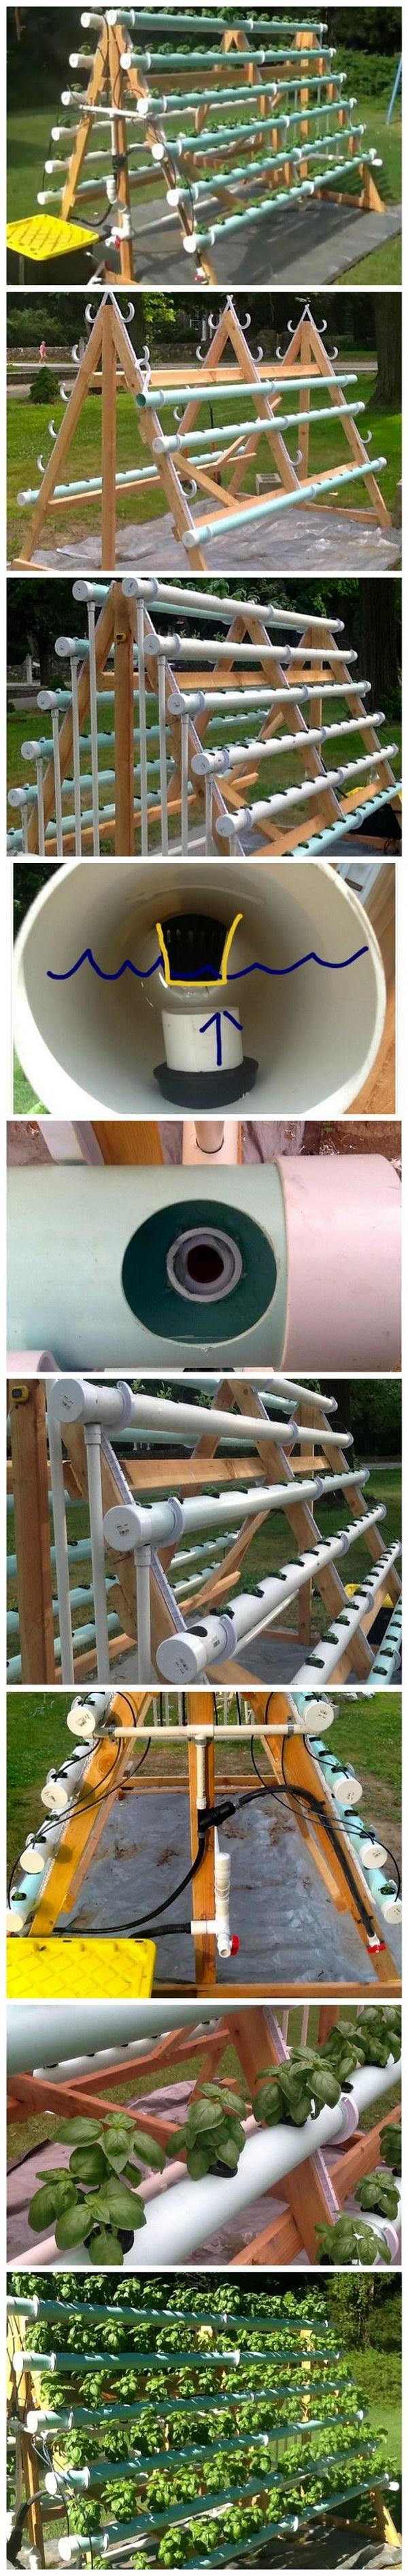 DIY Vertical A Frame Hydroponic System Tutorial